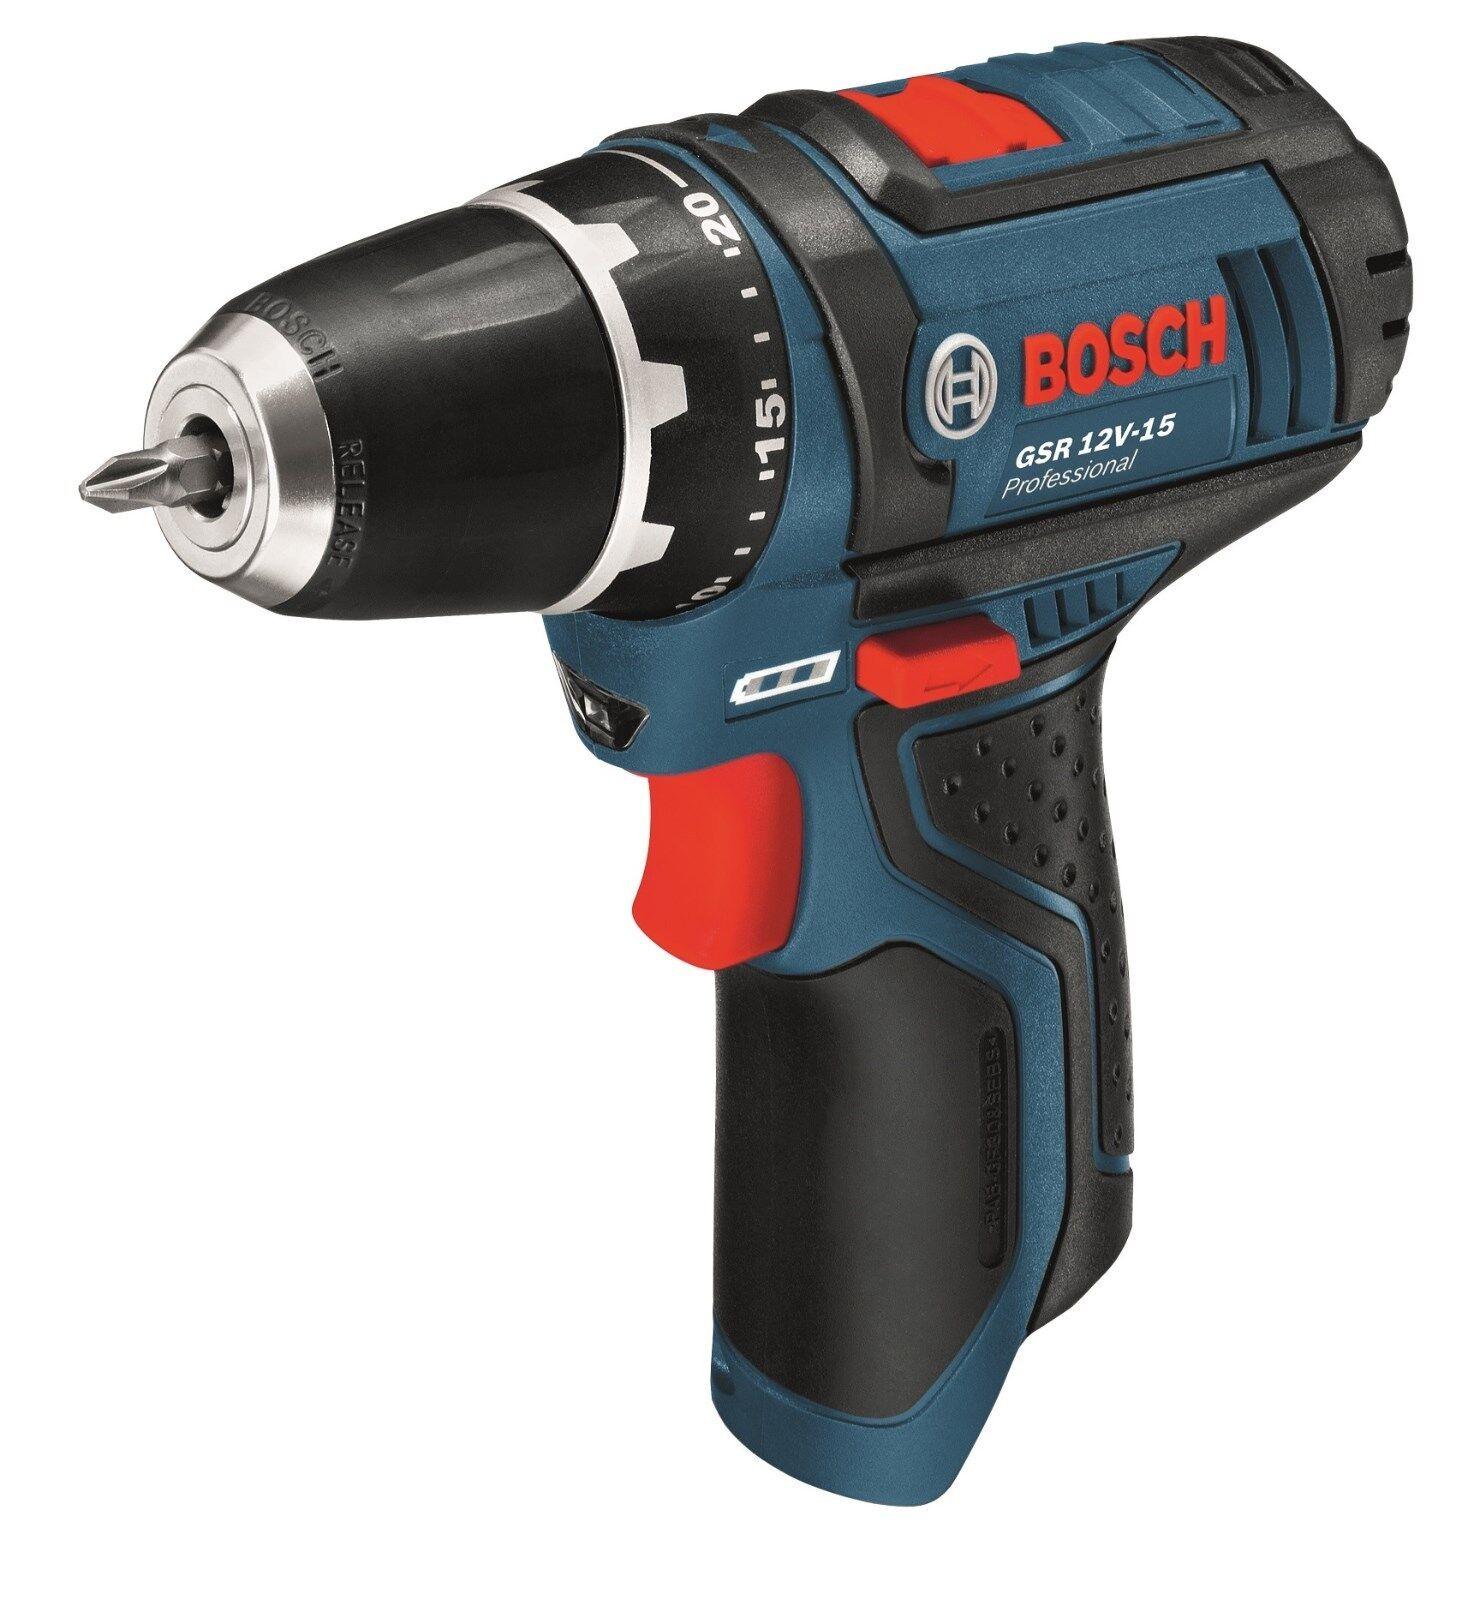 Bosch Akkuschrauber GSR 12V-15   10,8-2-LI ohne Akku ohne Ladegerät